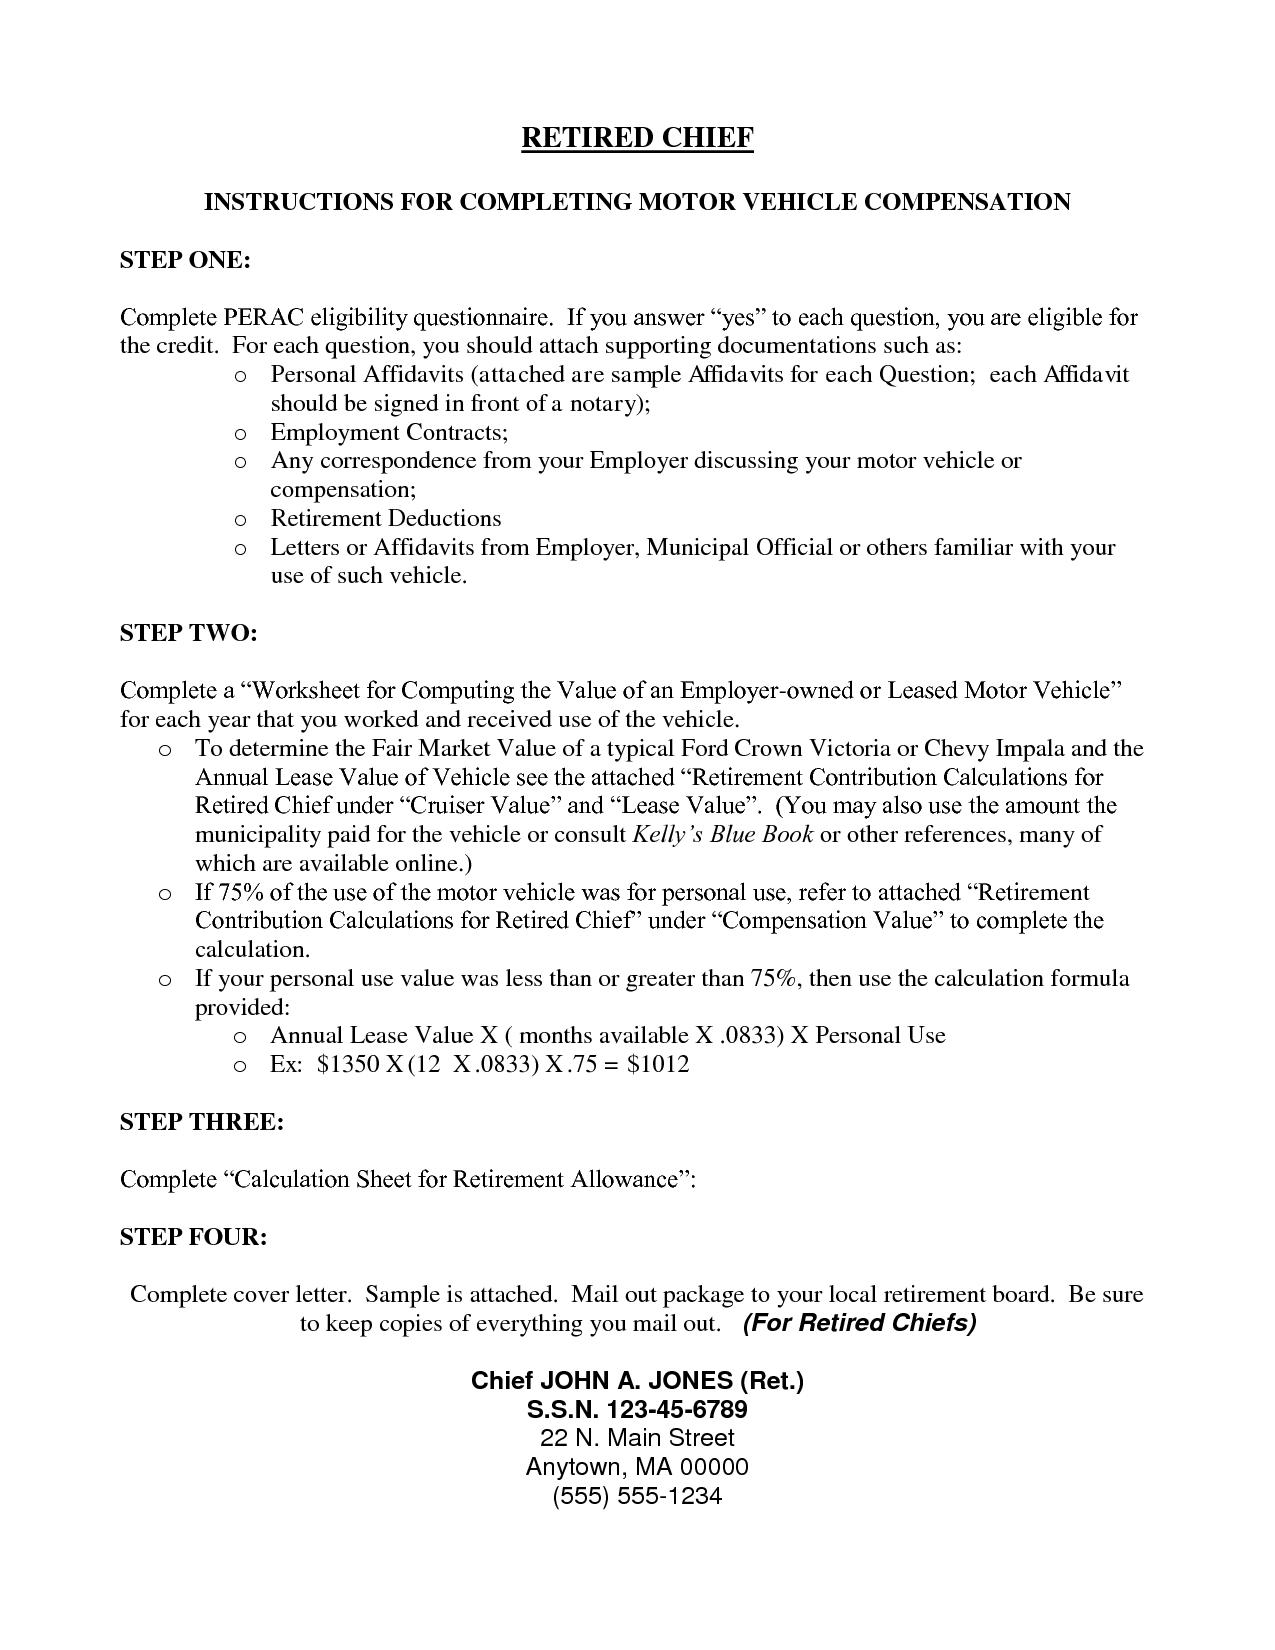 Template Of An Affidavit canada affidavit and declaration forms – Simple Affidavit Form